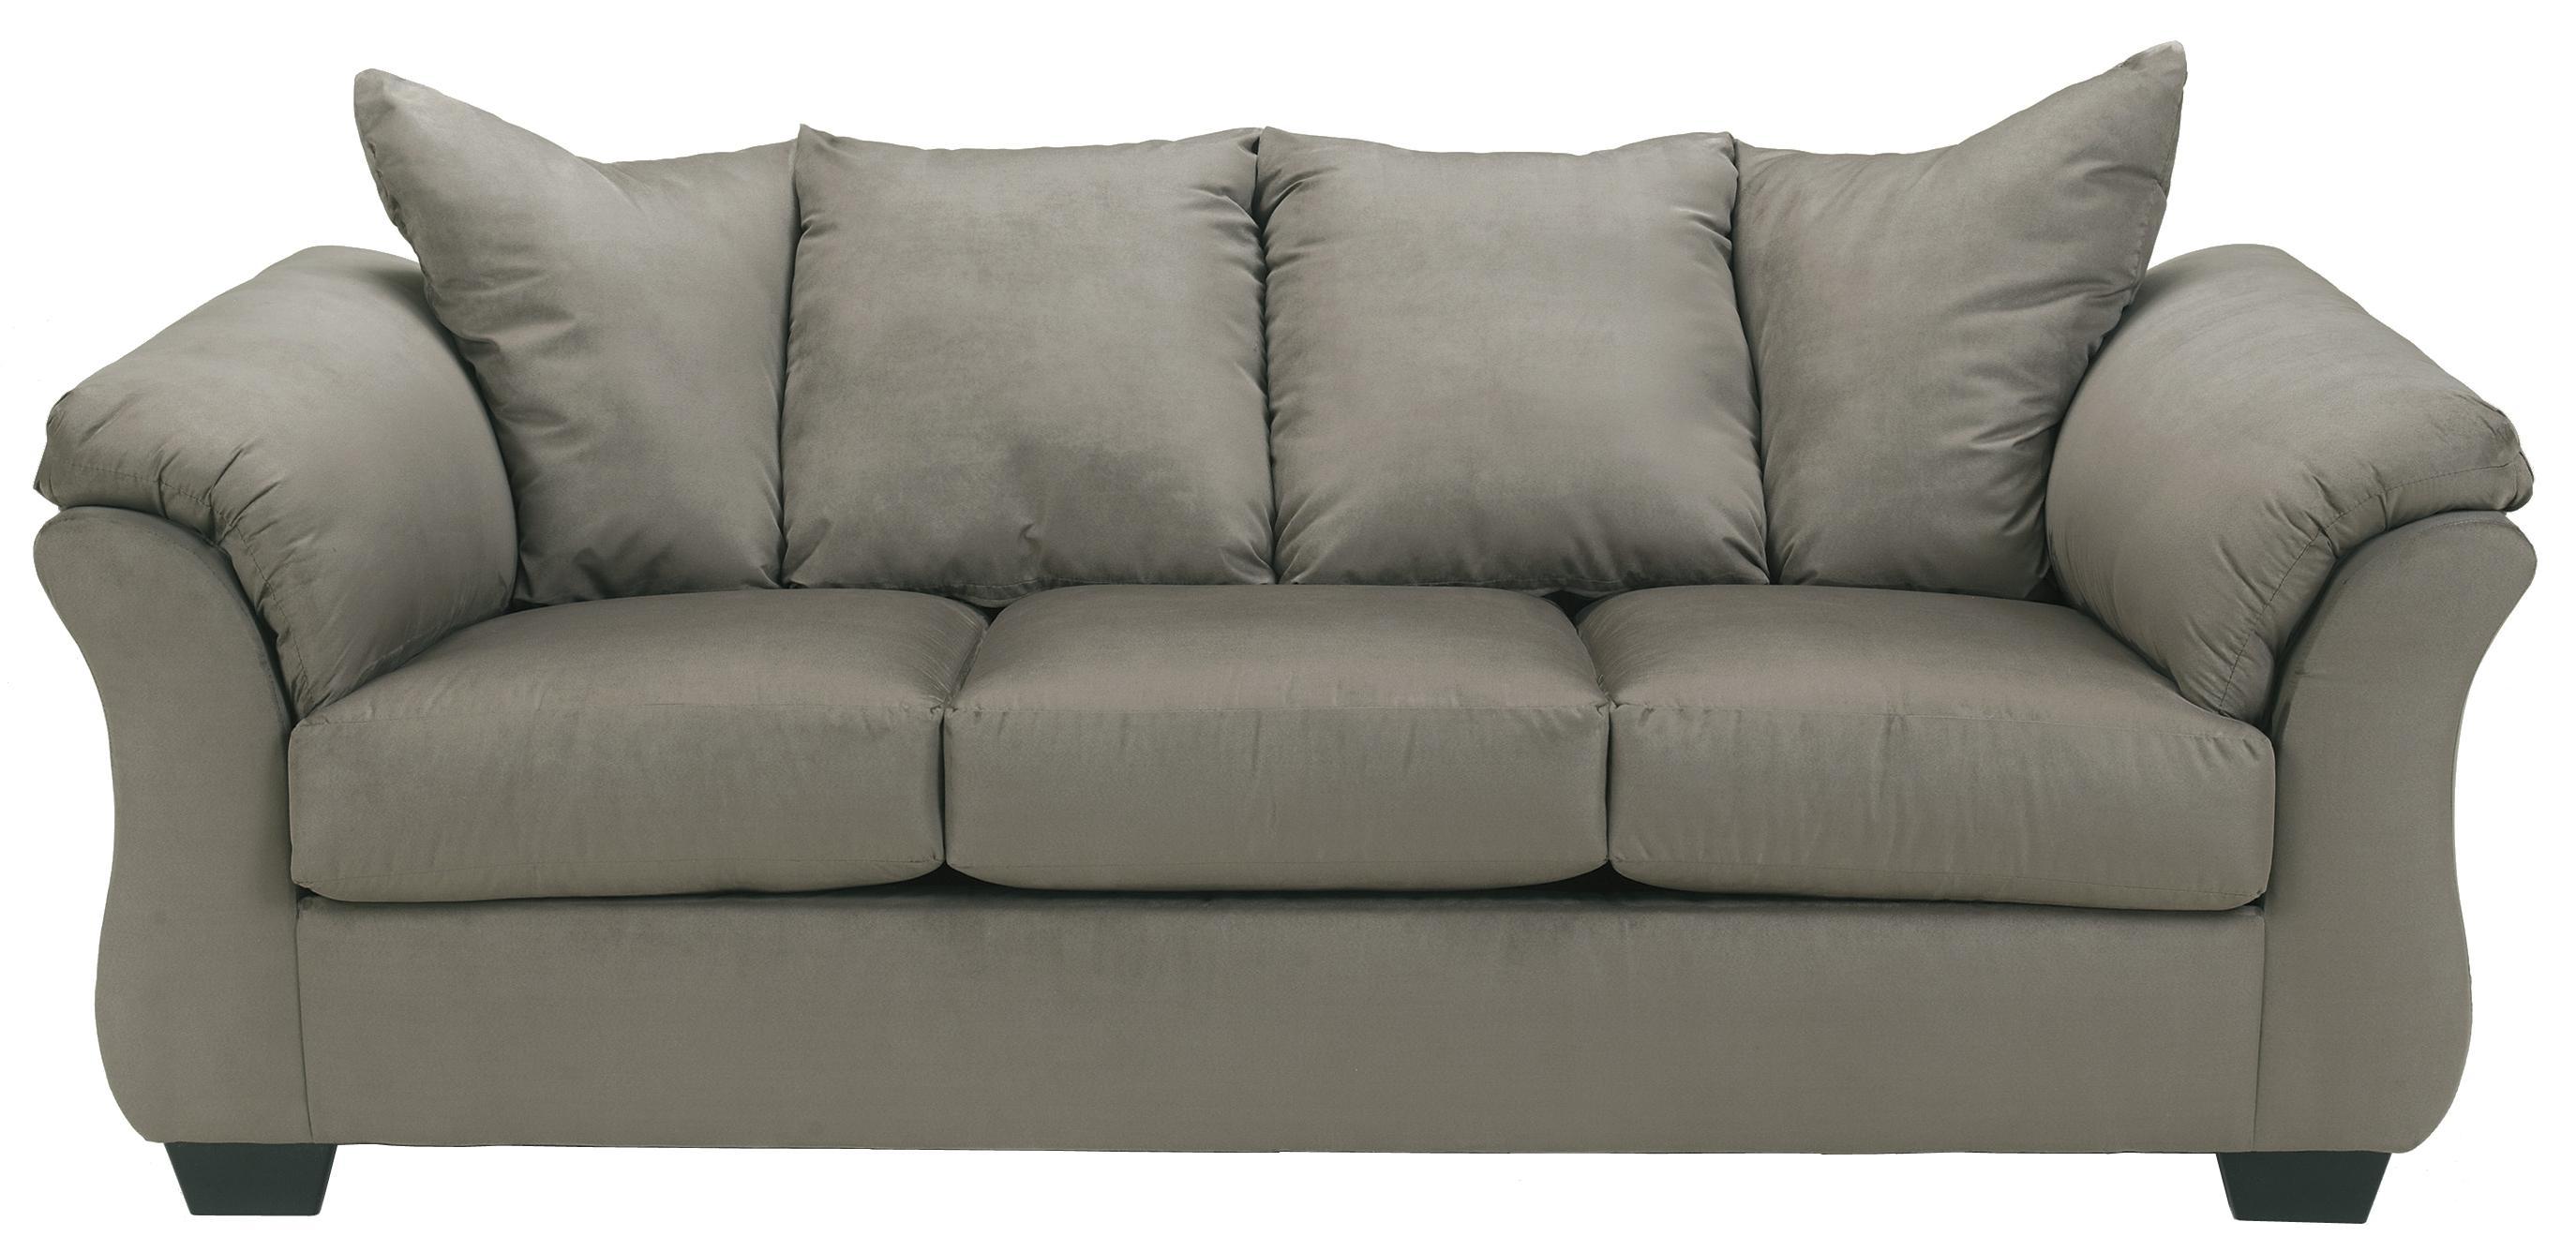 Ashley (Signature Design) Darcy   Cobblestone Contemporary Stationary Sofa  With Flared Back Pillows   Johnny Janosik   Sofas